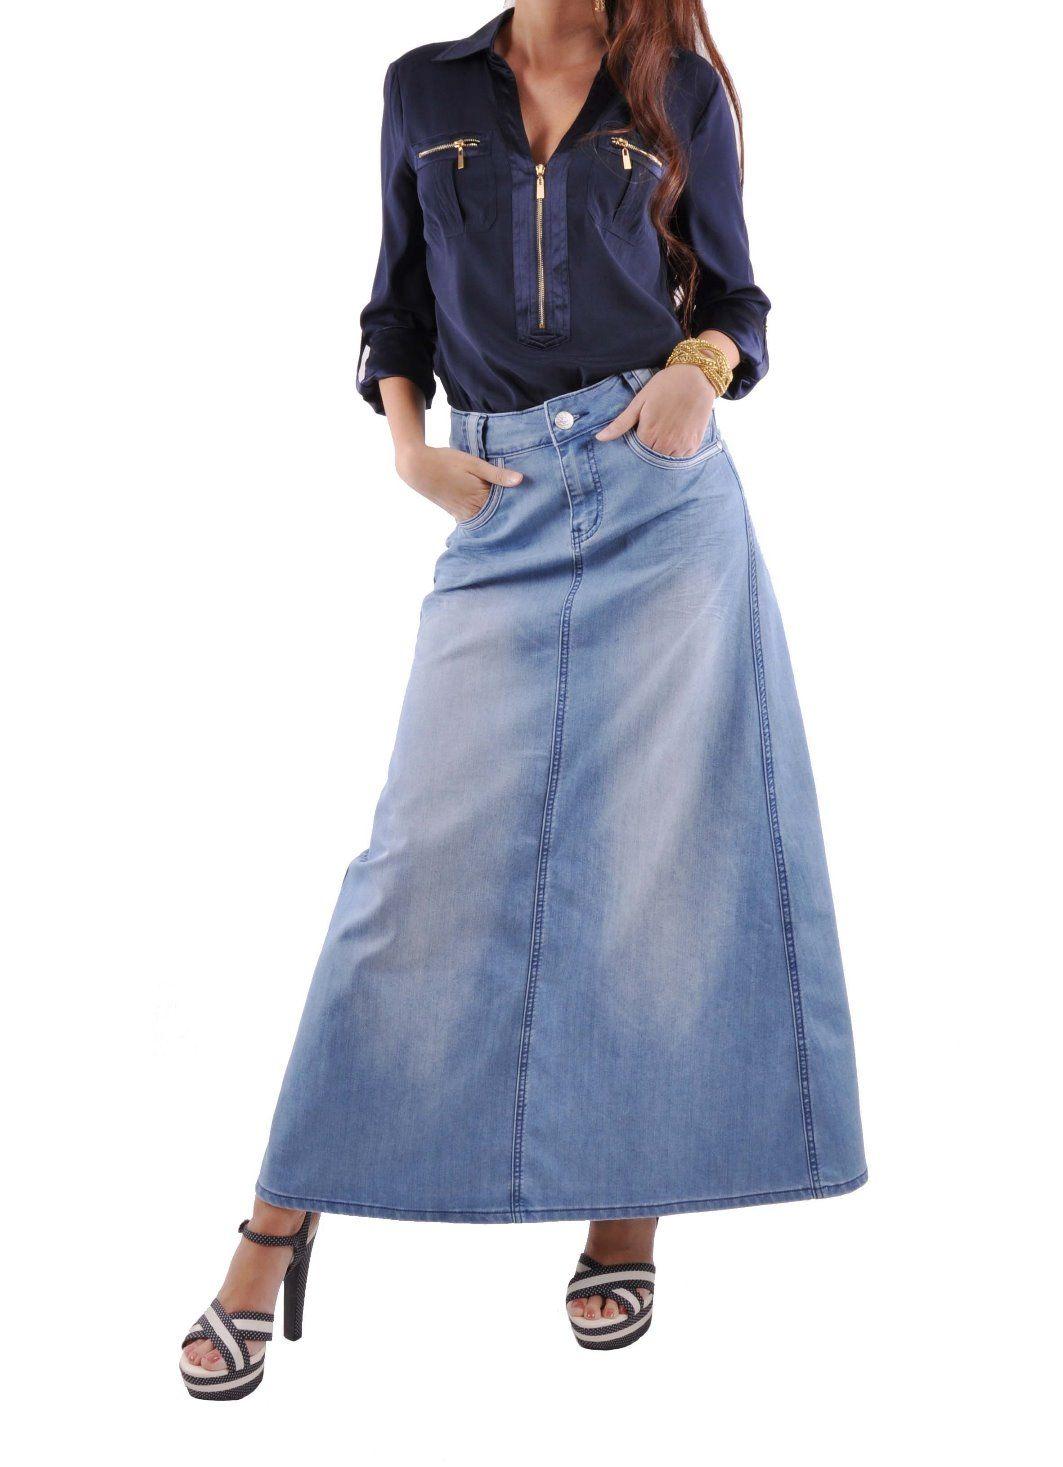 c9be653ed1 Rosie Chic Long Denim Skirt | My Style | Denim skirt, Skirts, Plus size  skirts